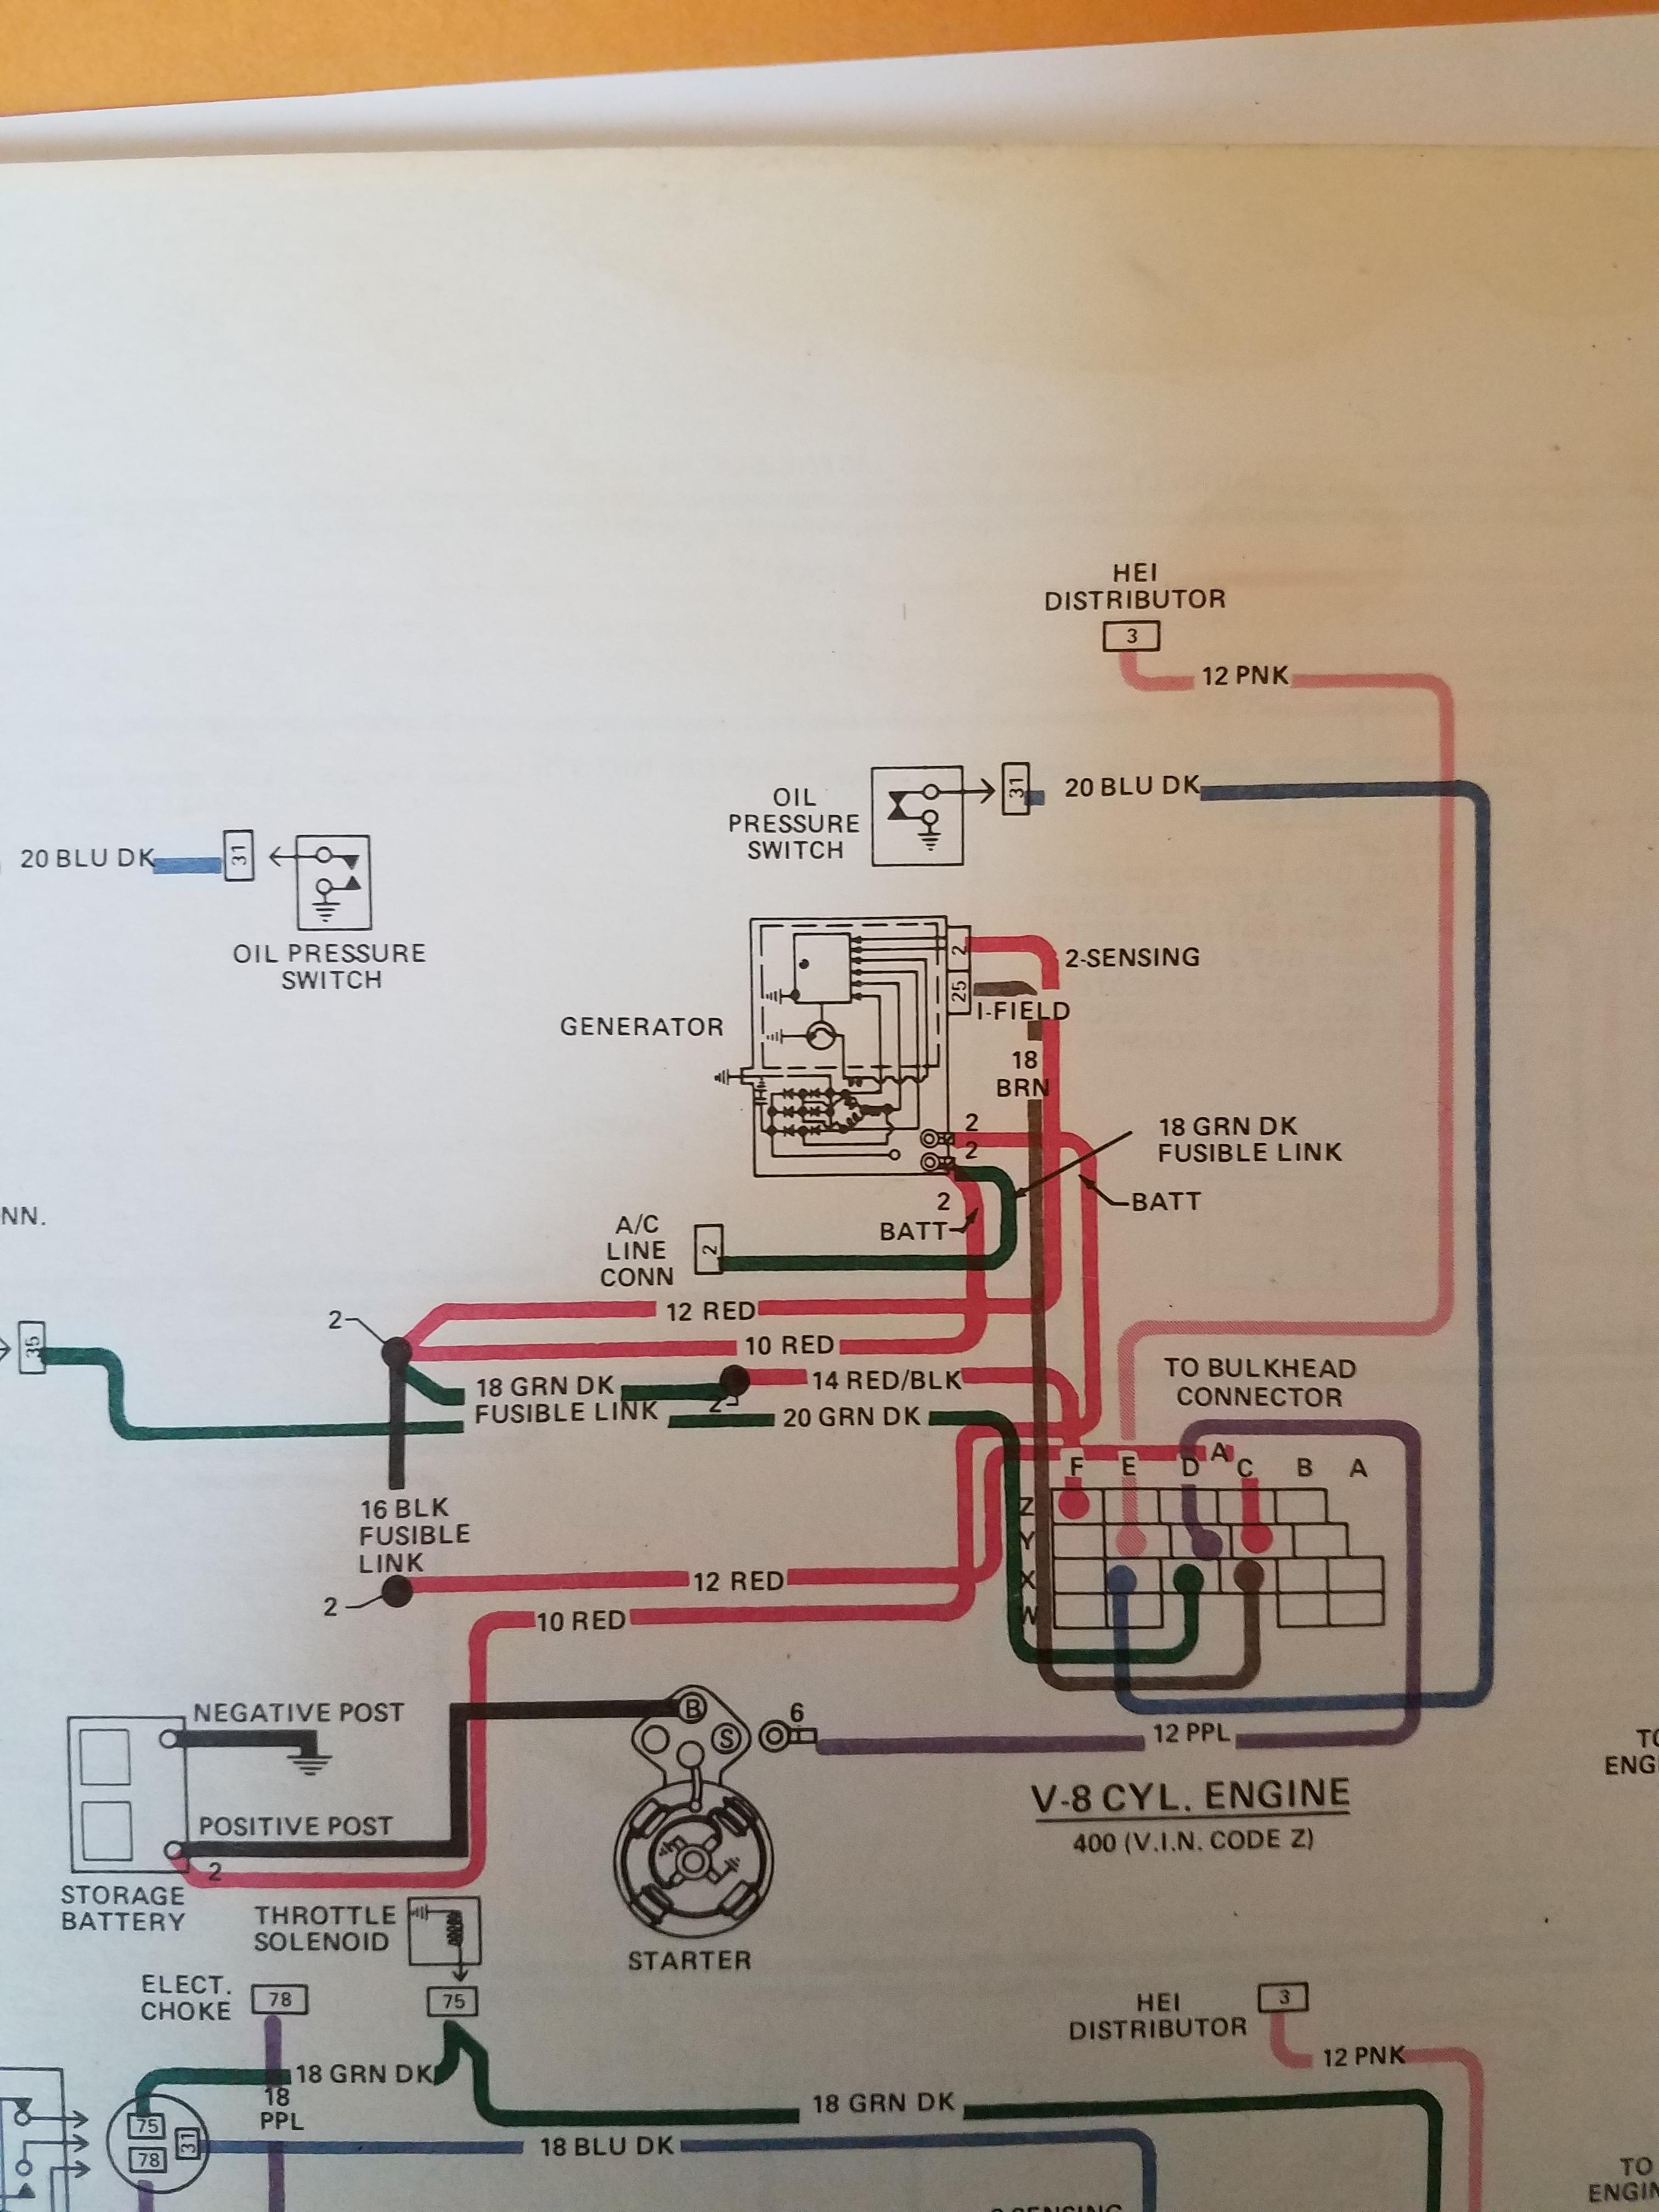 78 Pontiac Grand Prix Wiring Diagram Explained Diagrams Alternator 1978 Trans Am Circuit Connection U2022 2001 Schematic